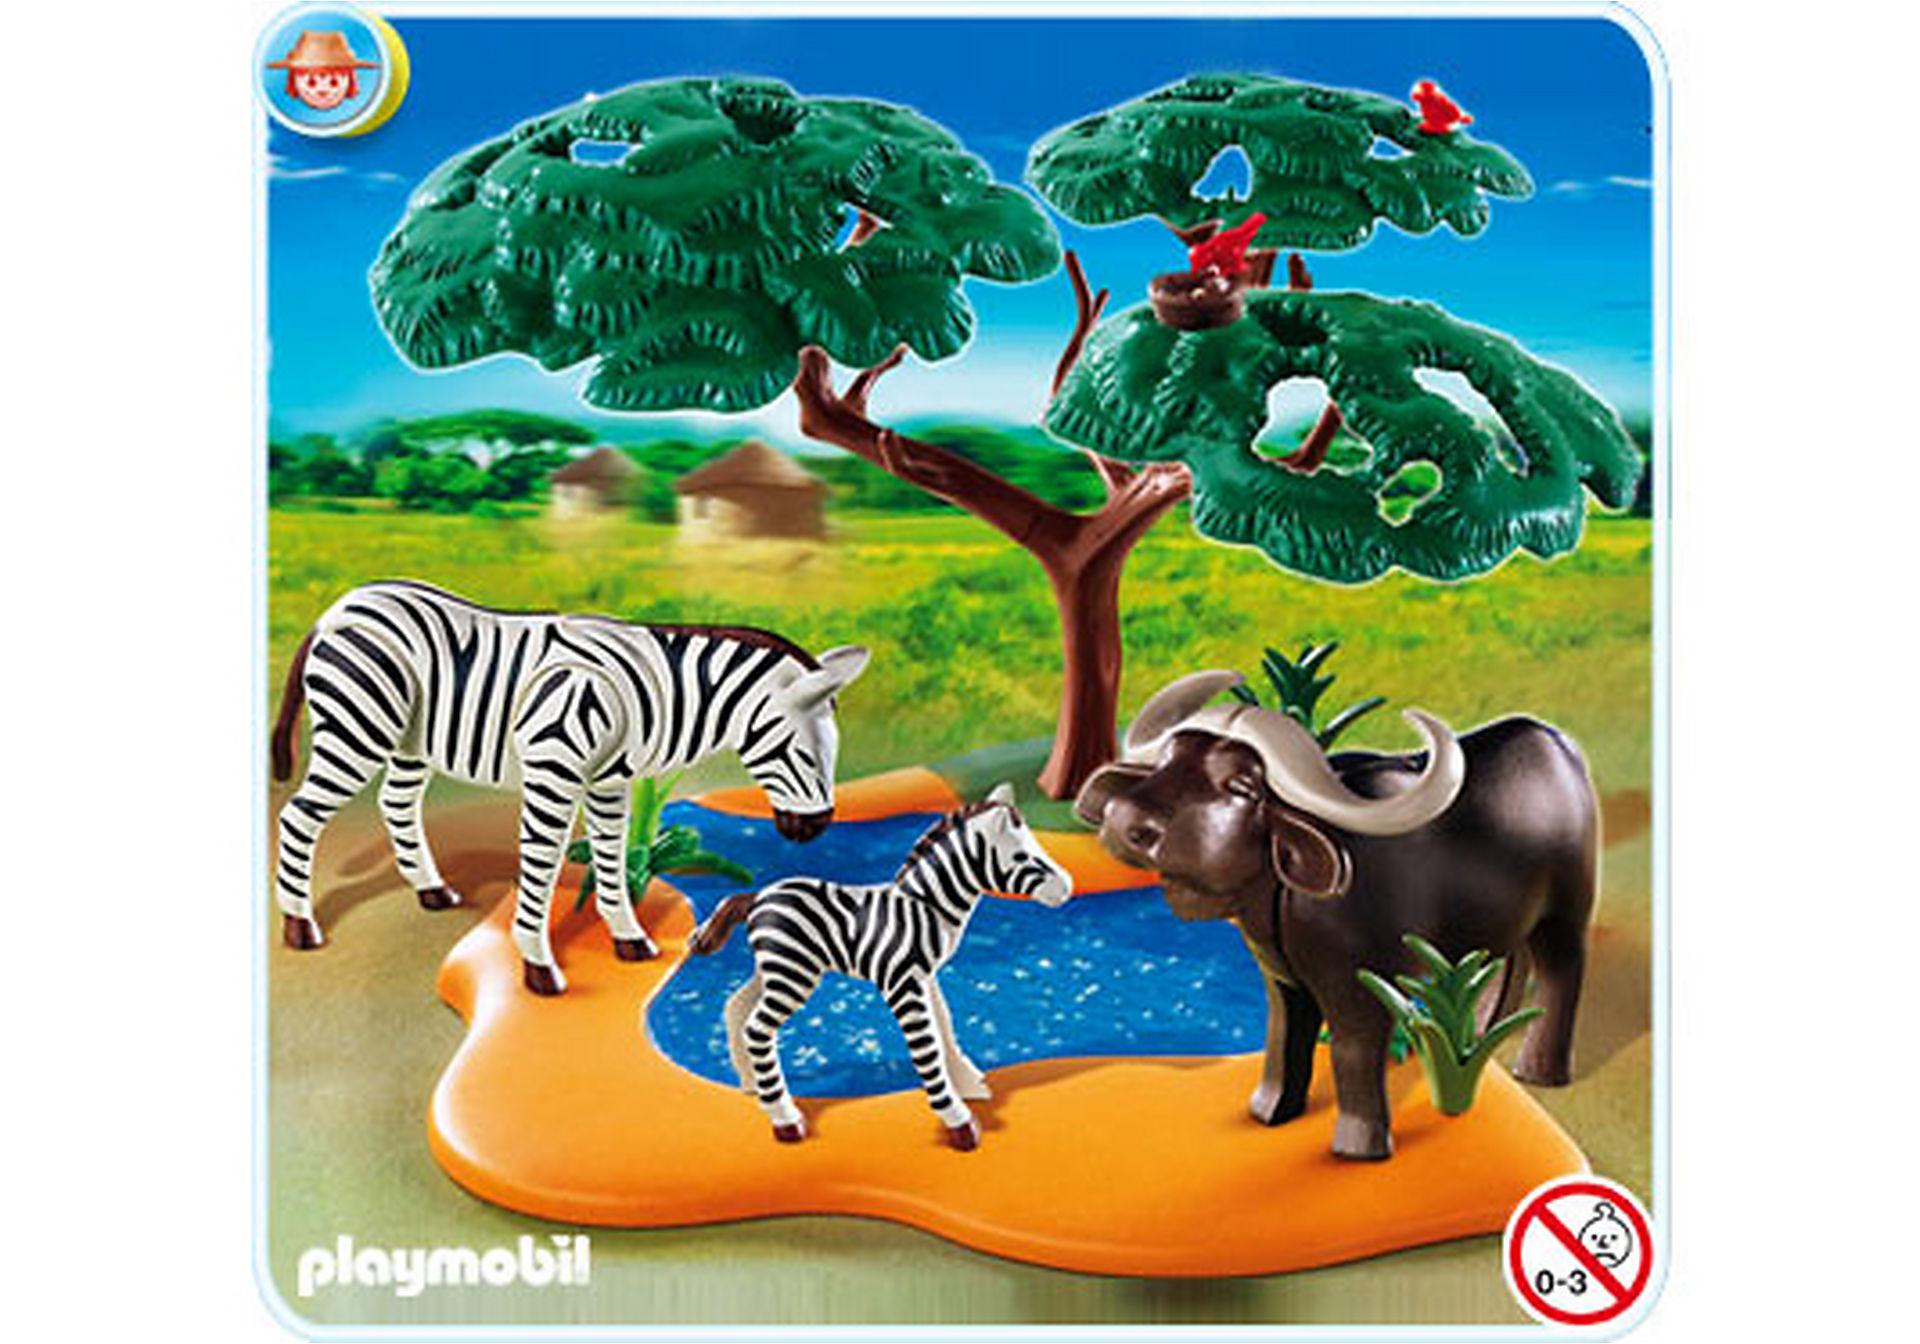 4828-A Kaffernbüffel mit Zebras zoom image1